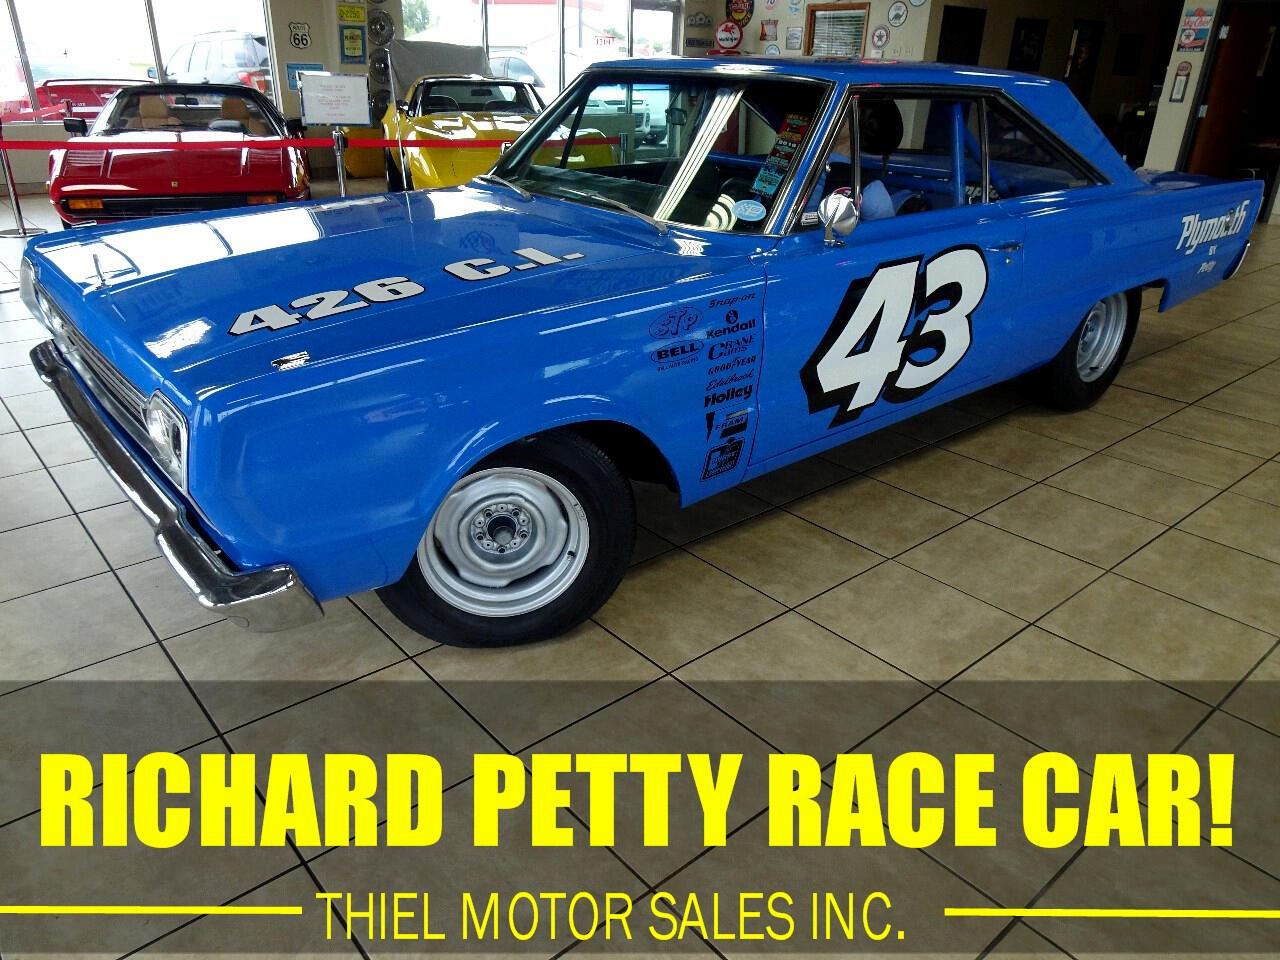 1967 Plymouth Belvedere Richard Petty Race Car